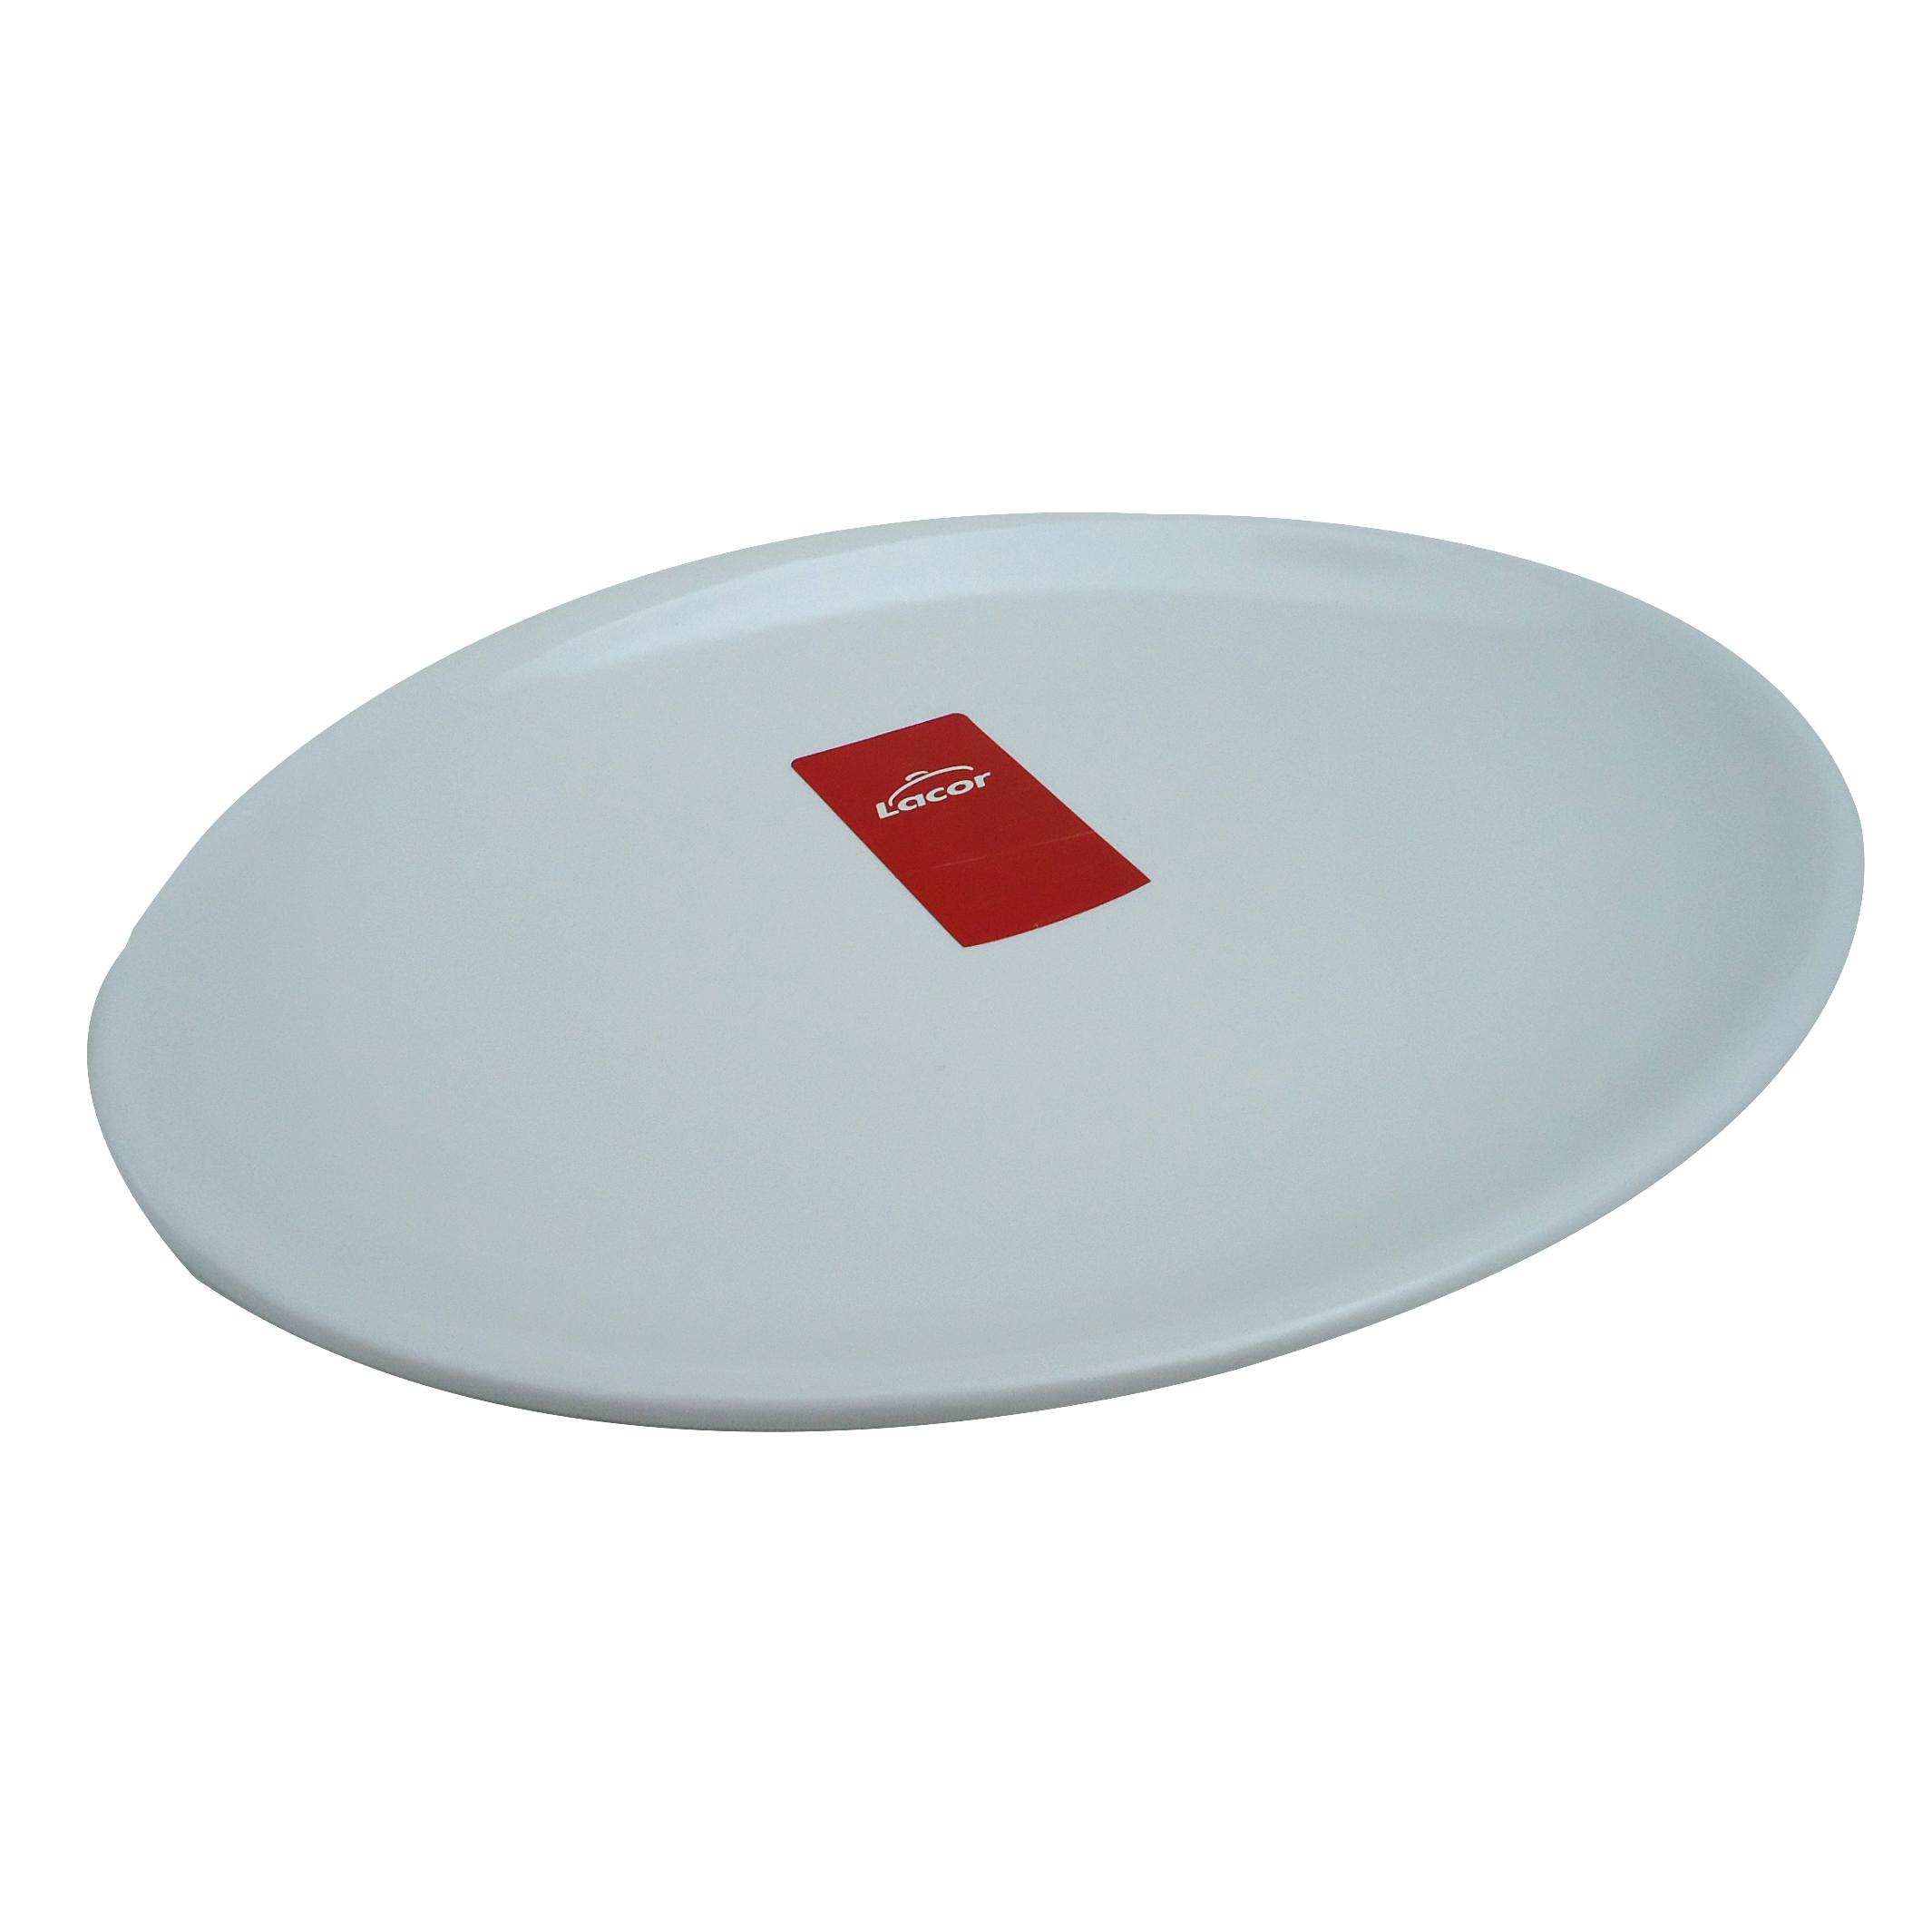 Lacor 62755 Δίσκος Οβάλ Μελαμίνης 314x234x25mm επαγγελματικός εξοπλισμός   επαγγελματικά σκεύη είδη σερβιρίσματος   εξαρτήματα